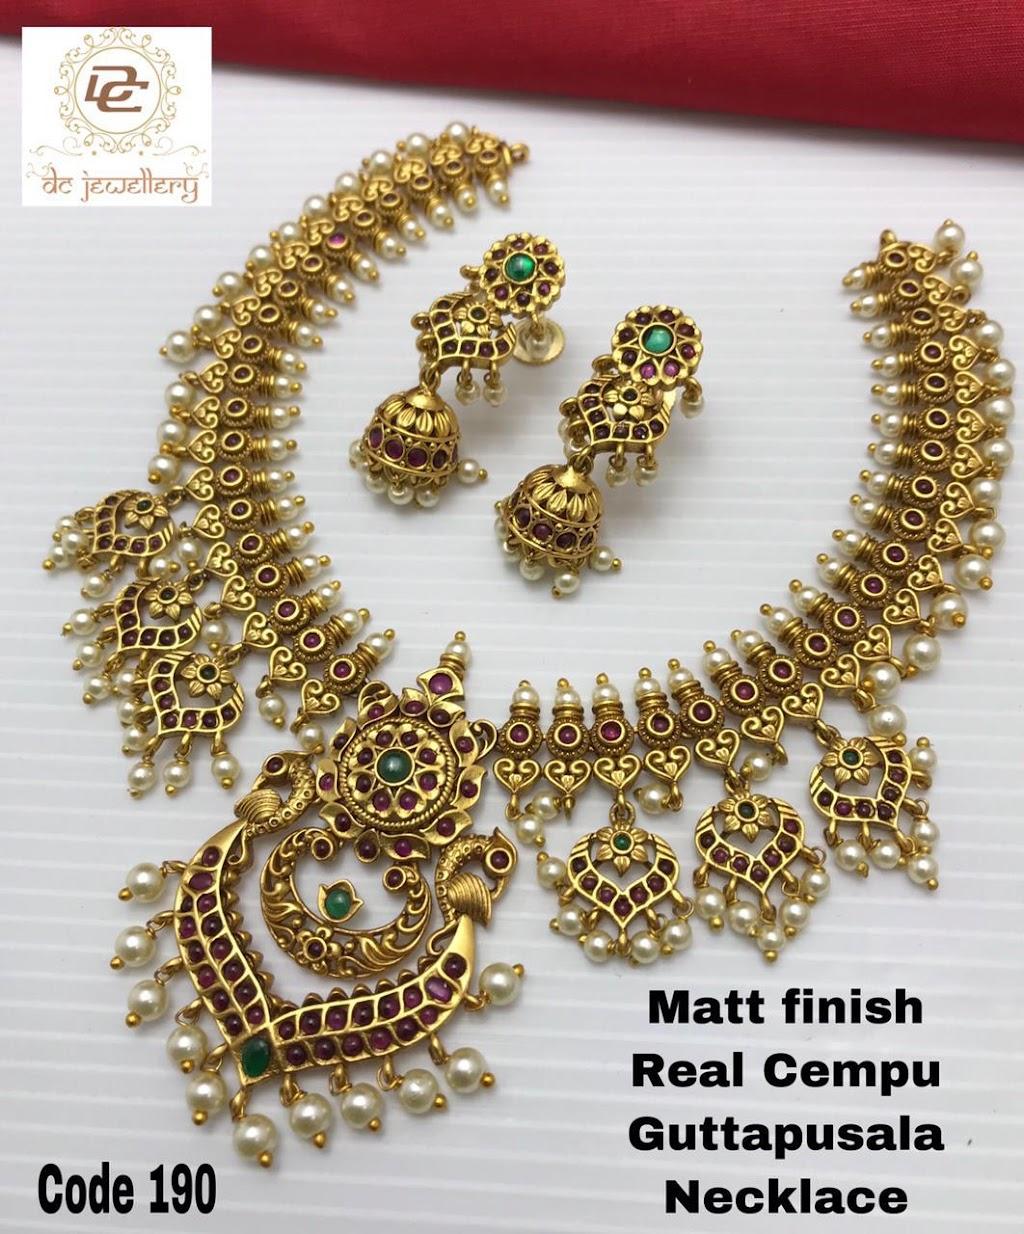 Sans jewelry creations llc - jewelry store    Photo 2 of 2   Address: 2704 Leisure Ln, Little Elm, TX 75068, USA   Phone: (469) 347-3457